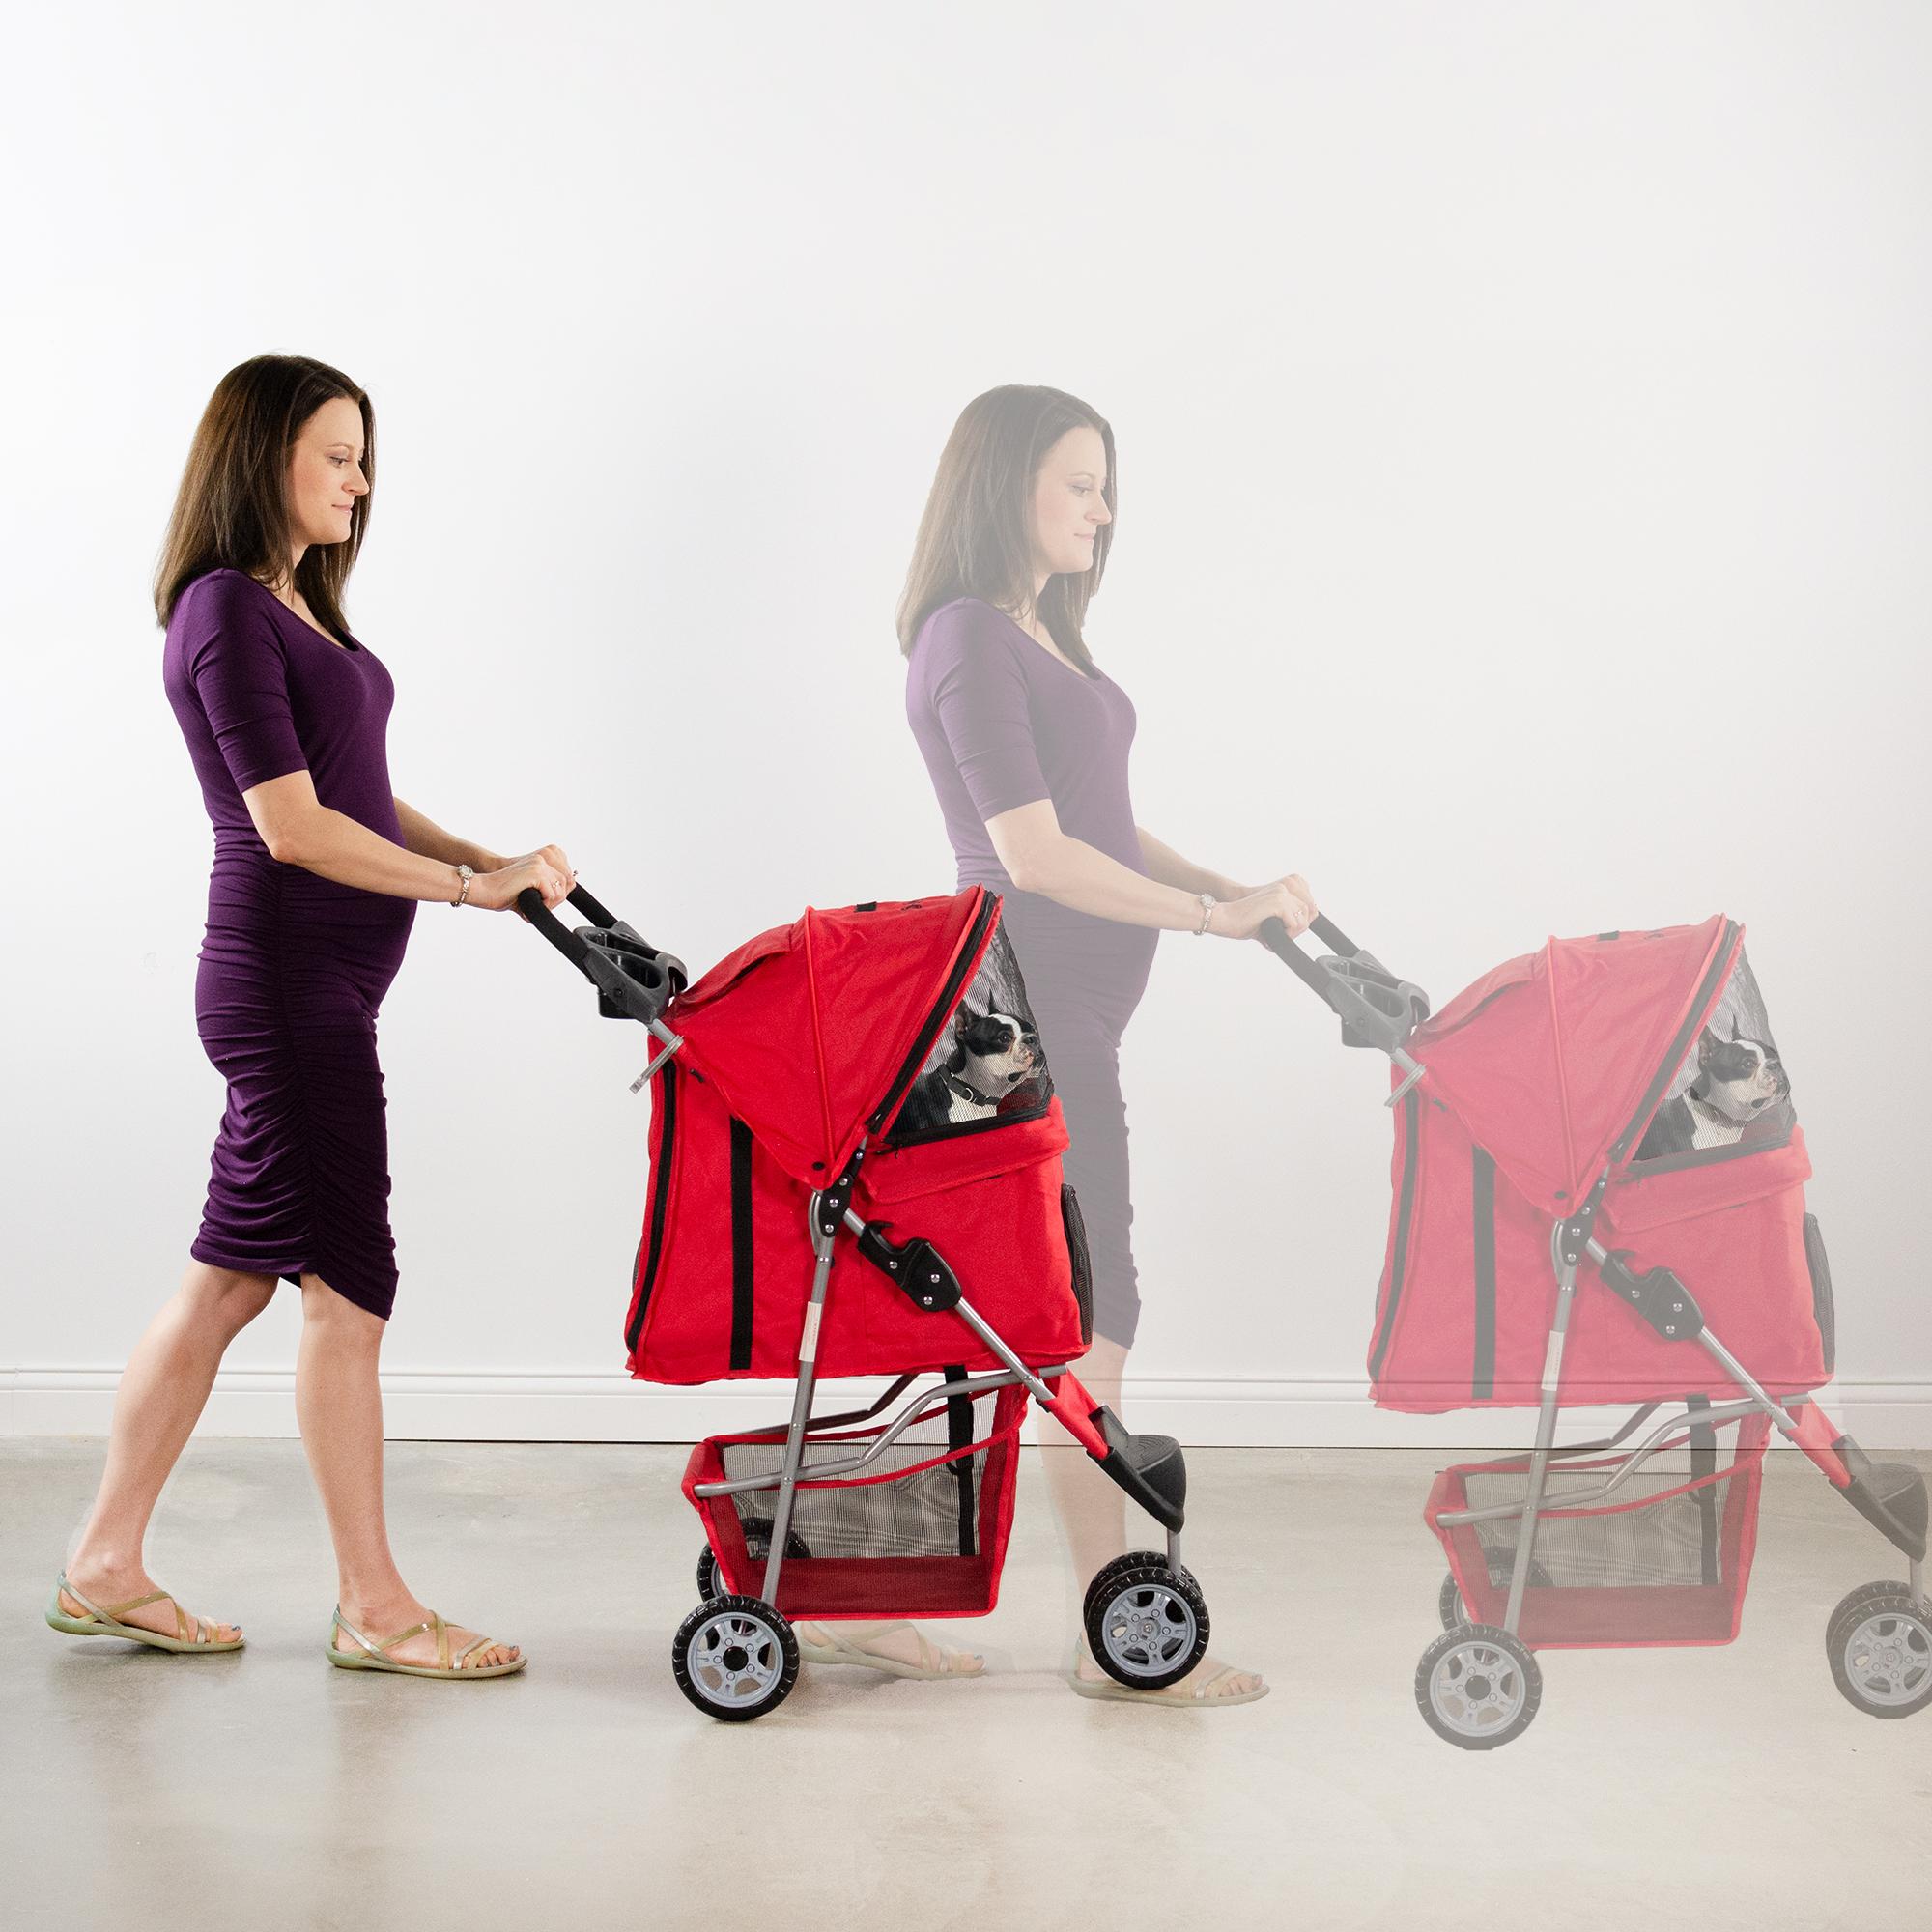 thumbnail 26 - VIVO Three Wheel Pet Stroller / Cat & Dog Foldable Carrier Strolling Cart